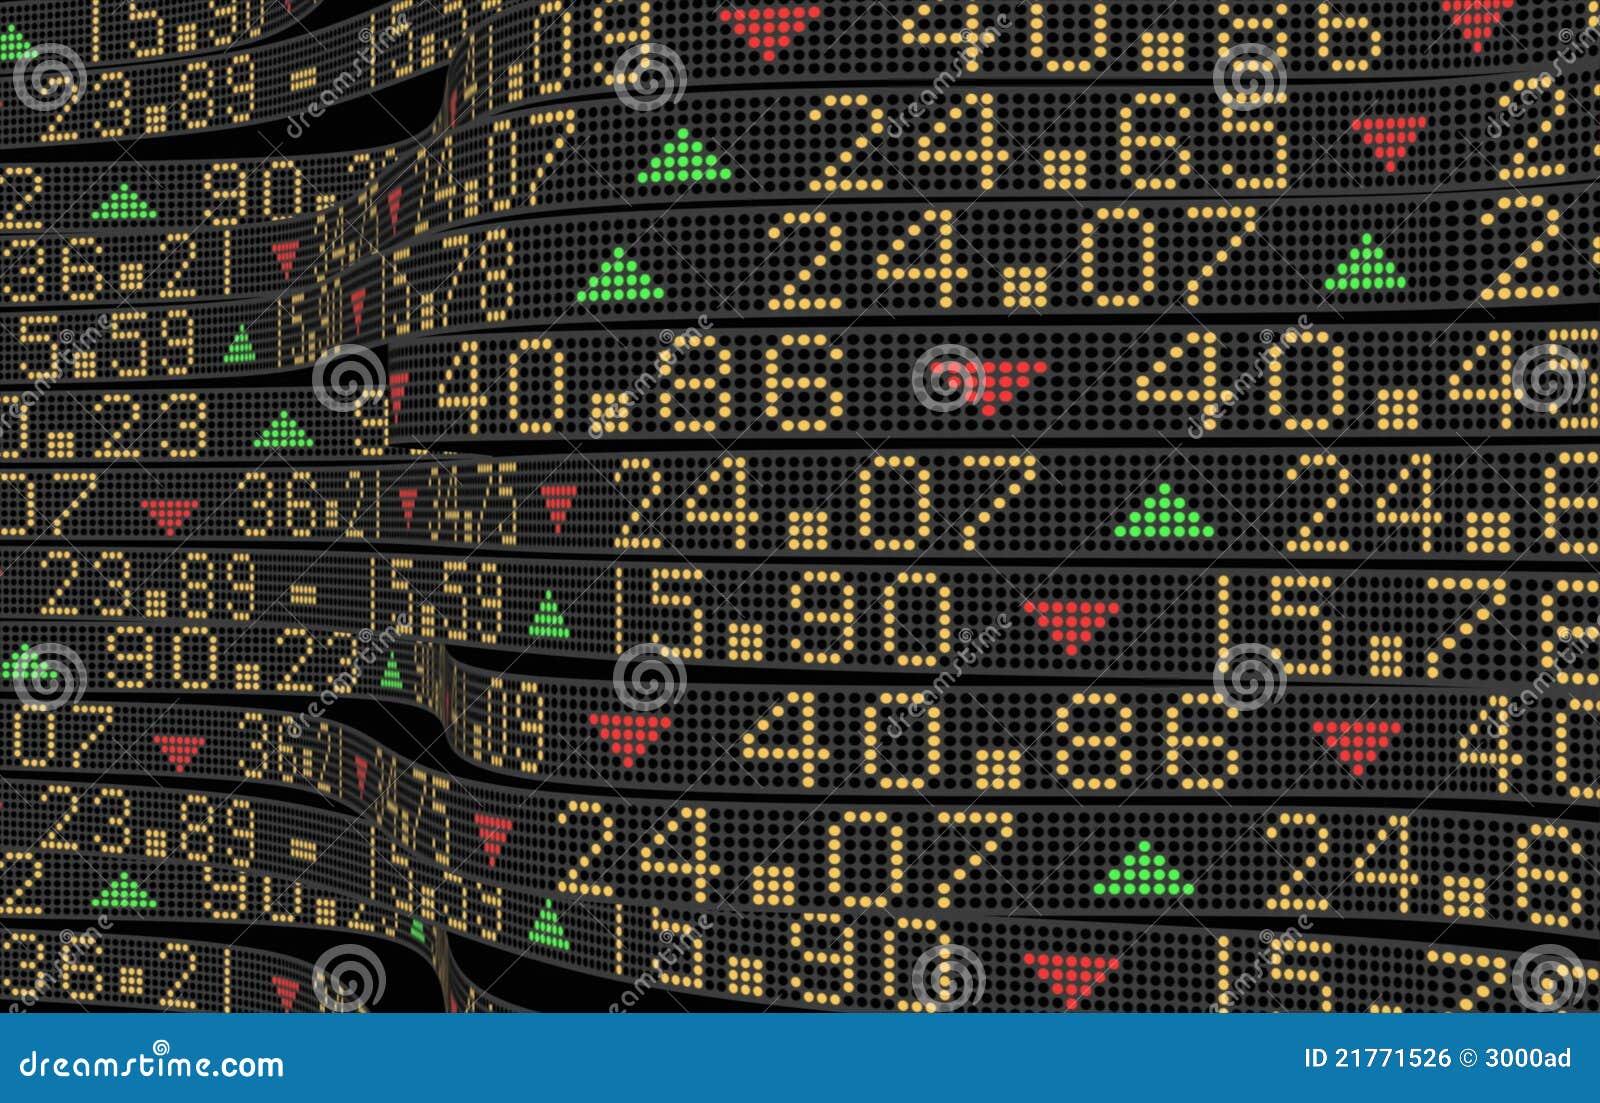 Thesis money market